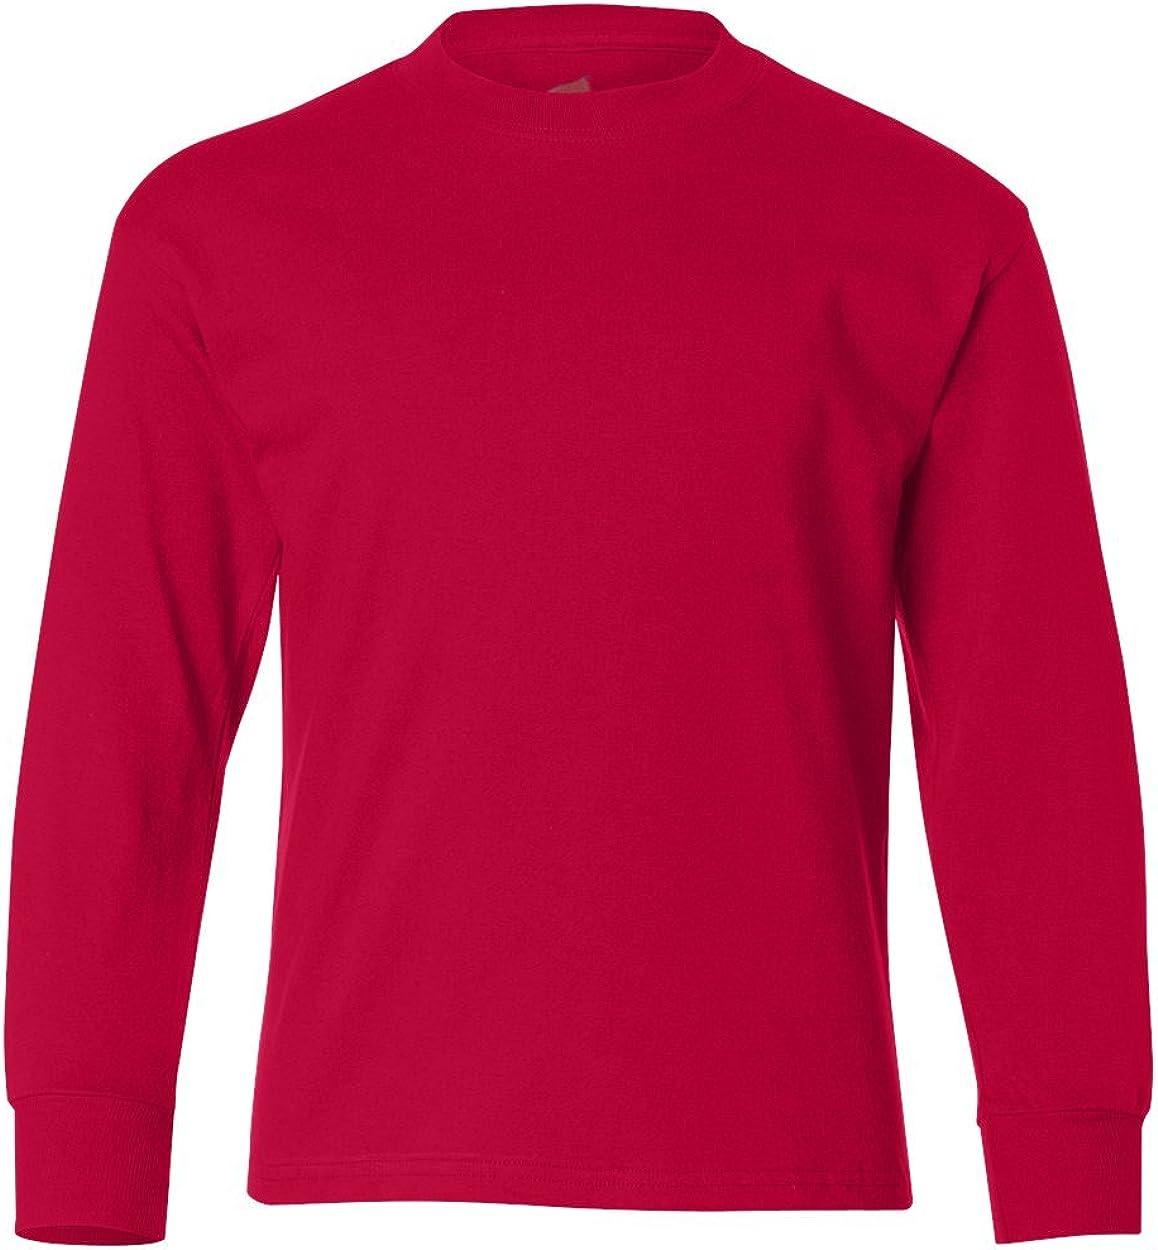 Hanes Youth Tagless 6.1oz. Long Sleeve T-Shirt